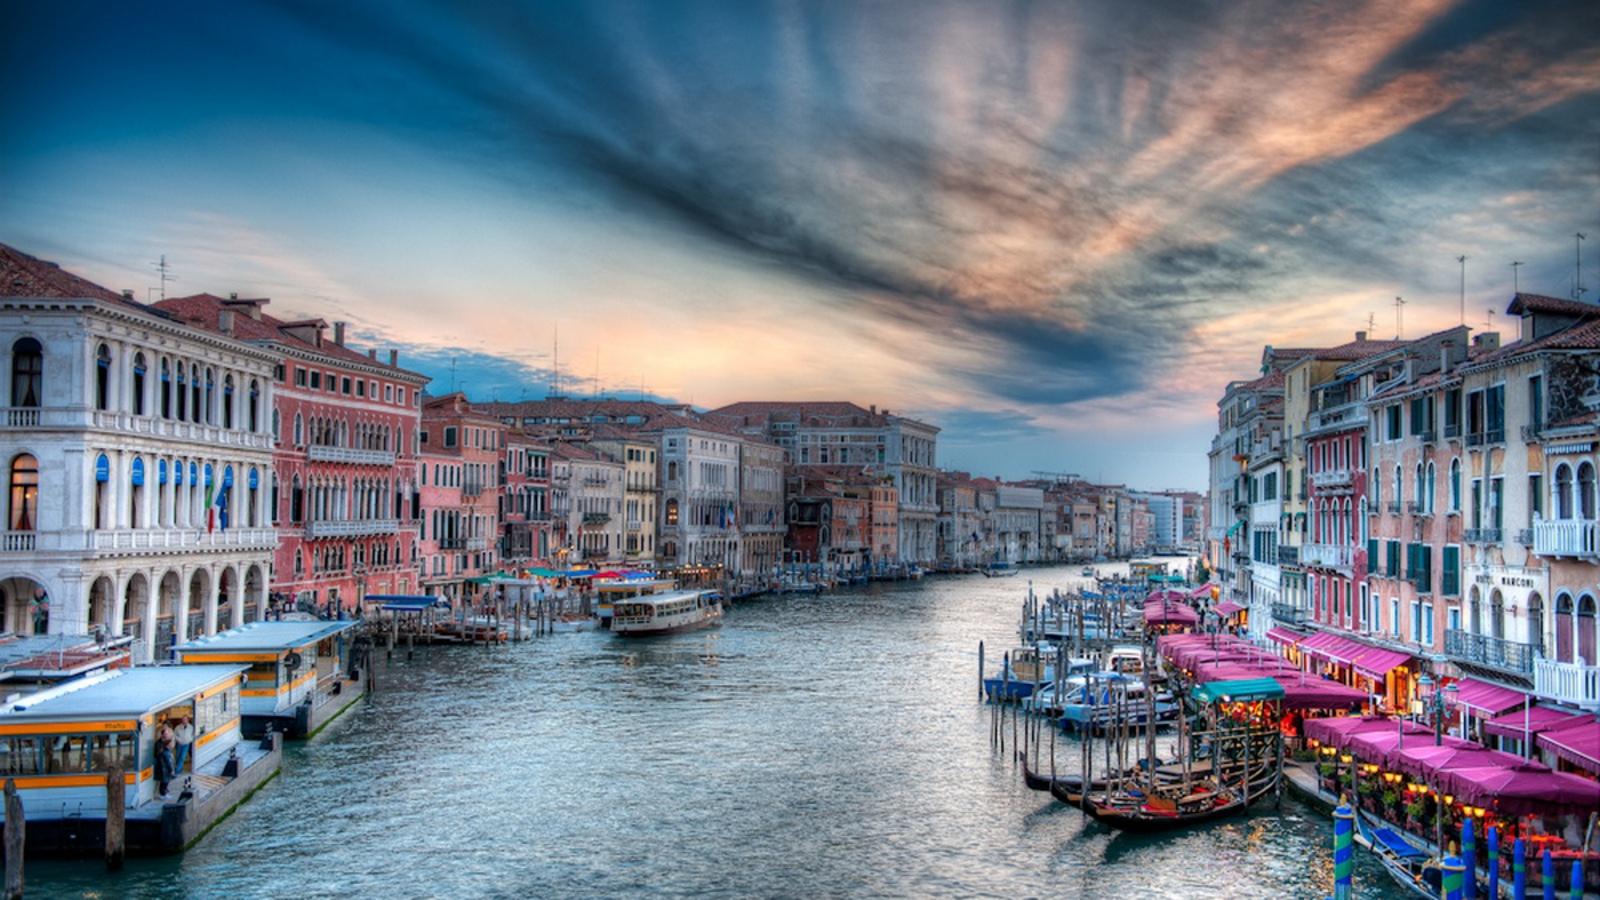 Venice Italy Computer Wallpapers Desktop Backgrounds 1600x900 ID 1600x900